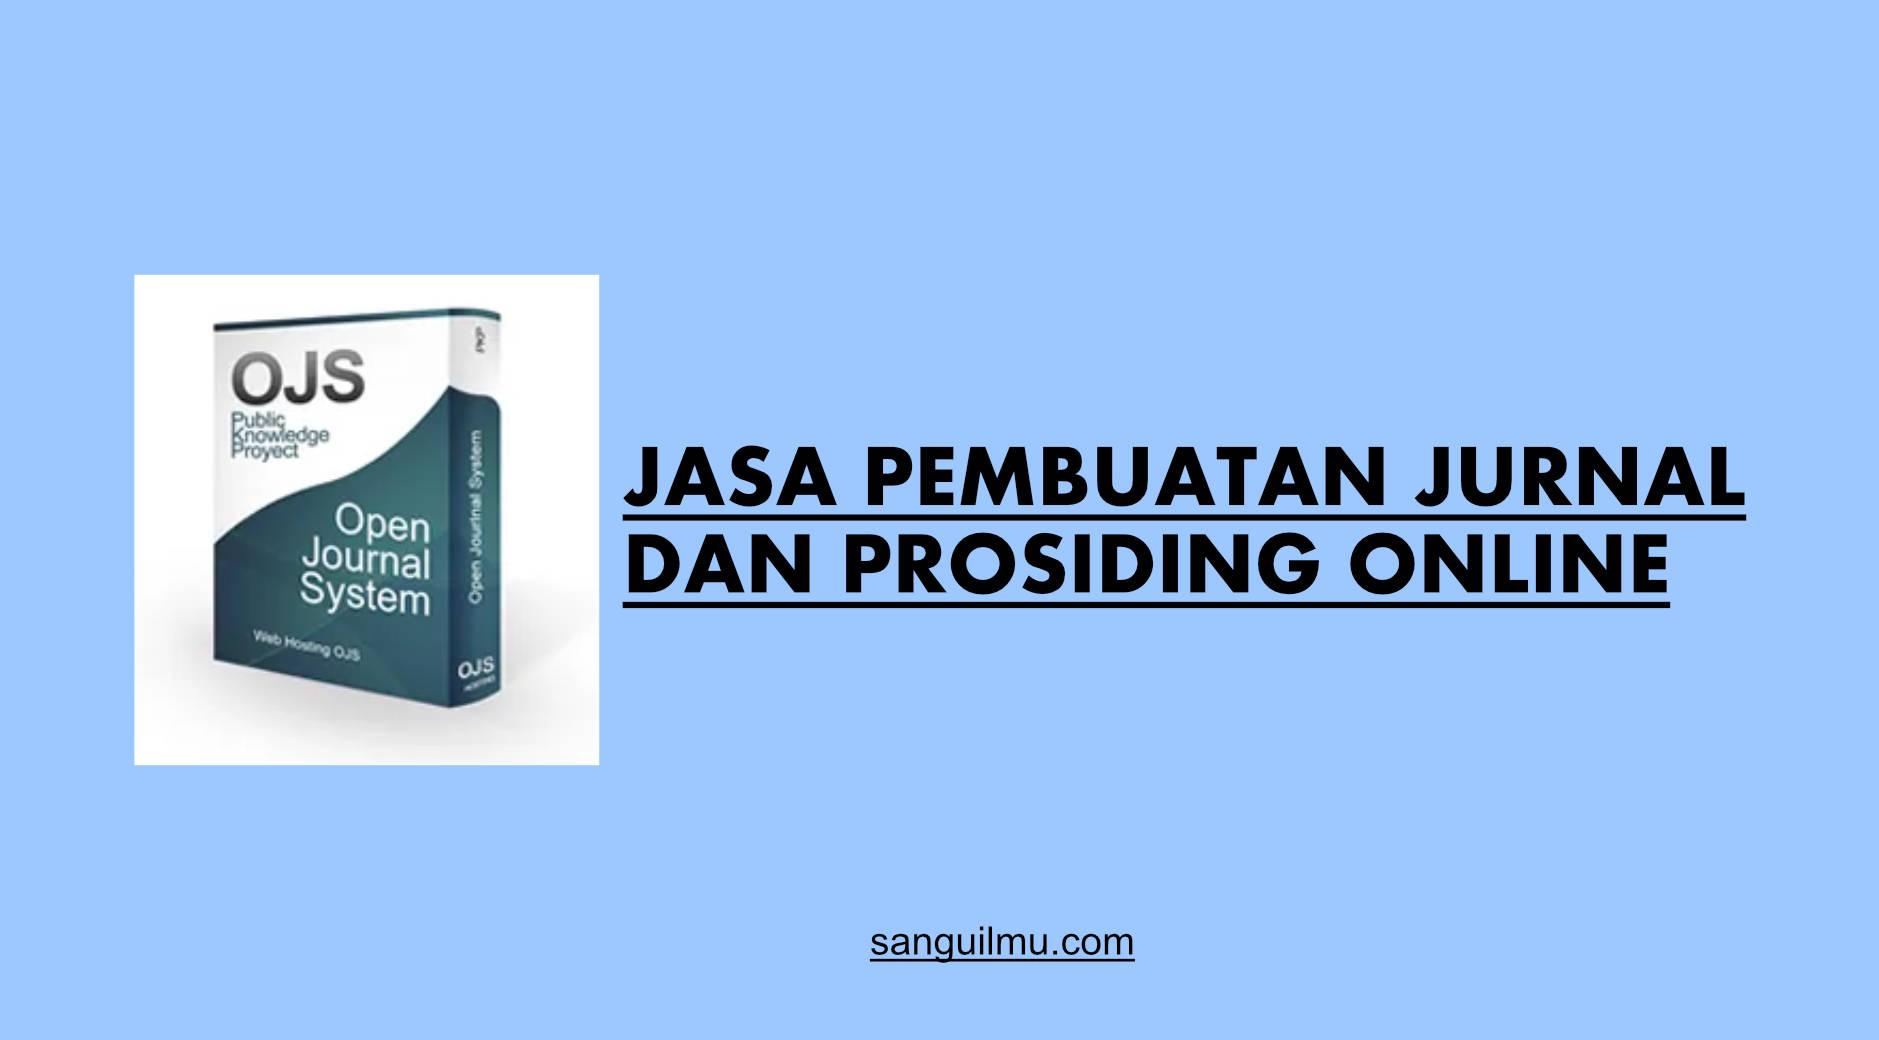 Jasa Pembuatan Jurnal dan Prosiding Online |